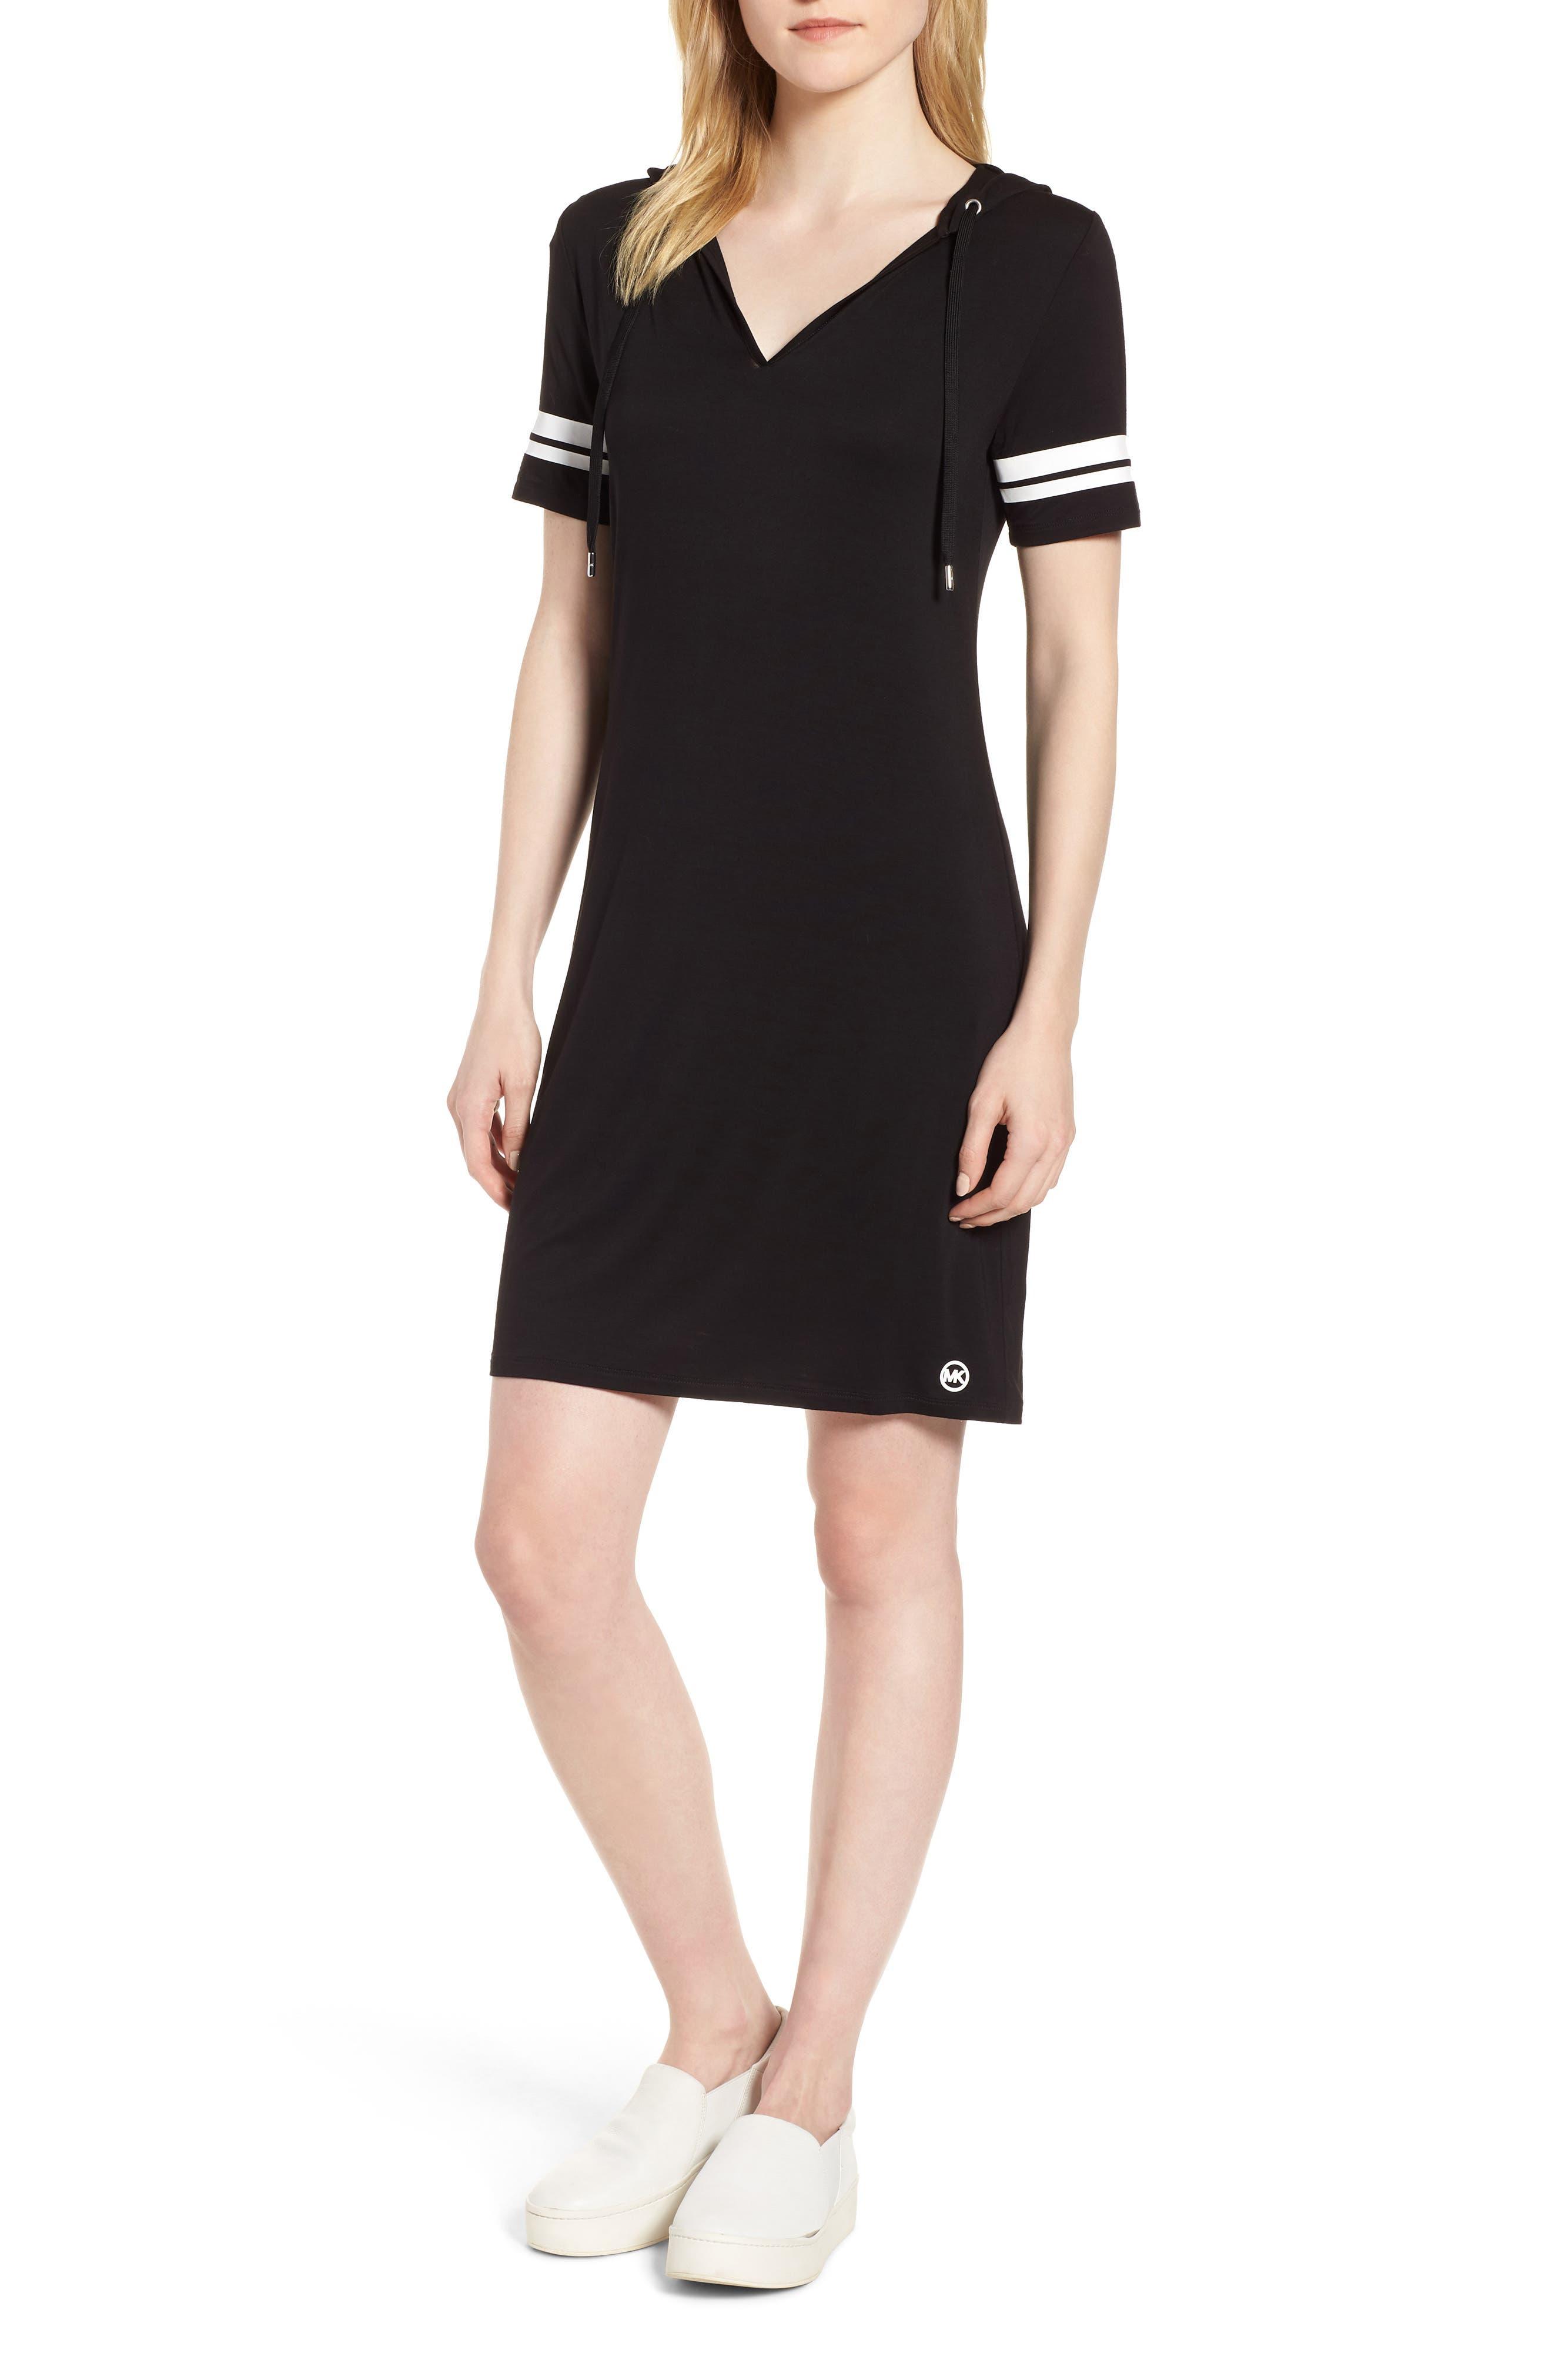 MICHAEL Michal Kors Stripe Sleeve Hoodie Dress,                             Main thumbnail 1, color,                             001